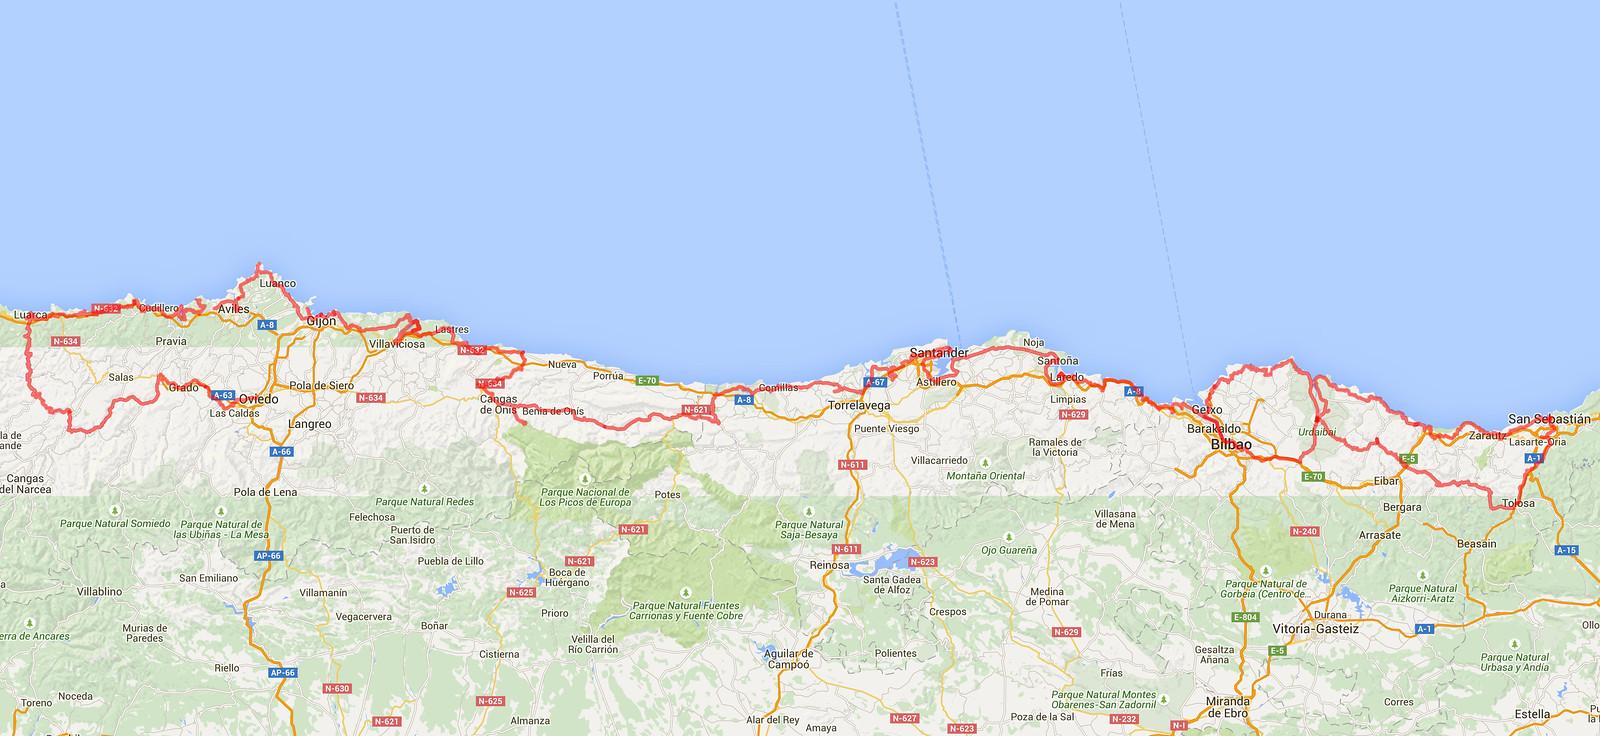 kart over nord spania Kart Over Nord Spania | Kart